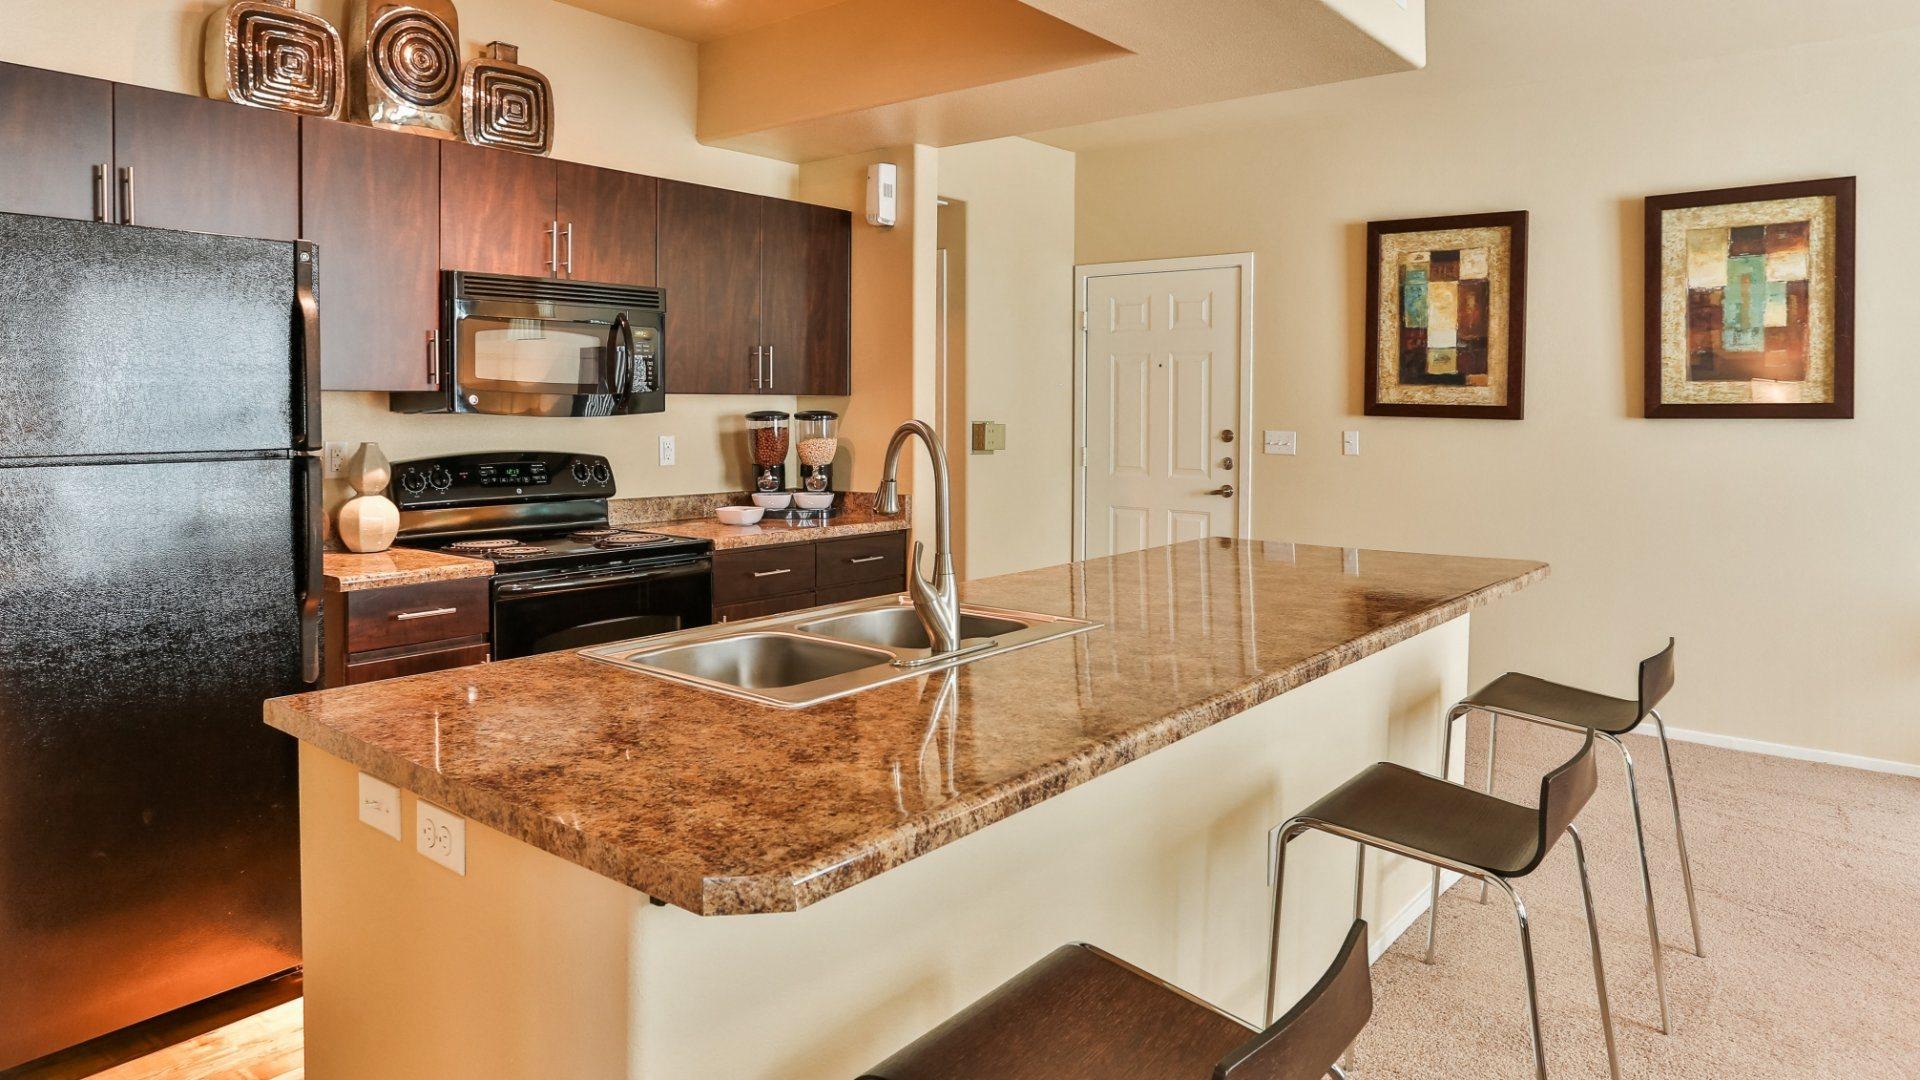 Spectra on 7th Apartments | North Phoenix in Phoenix, AZ